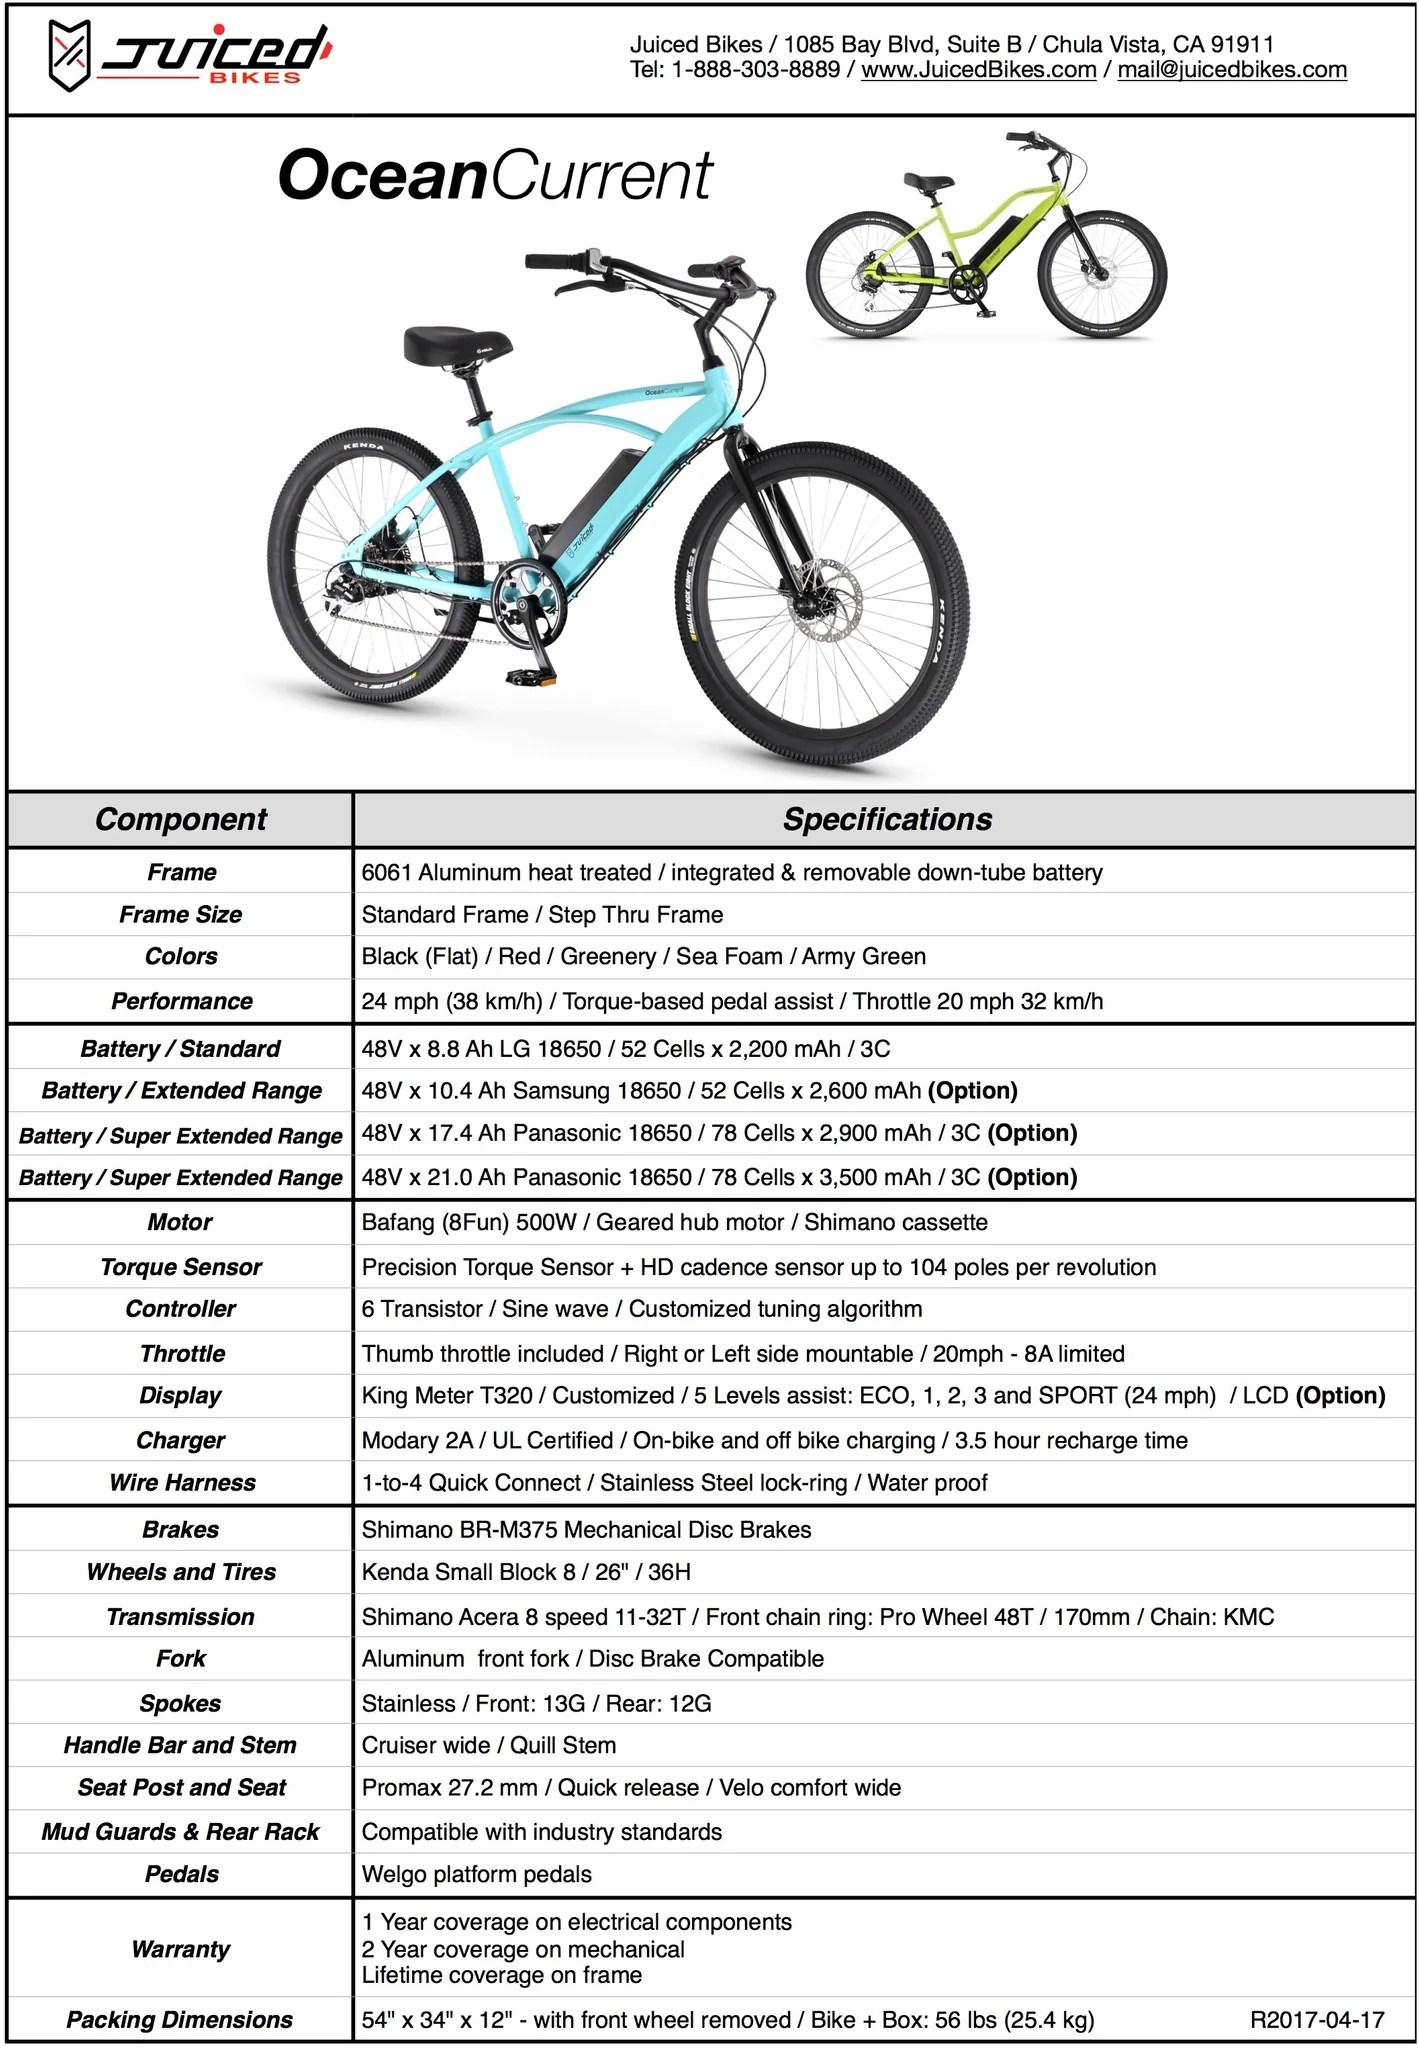 OceanCurrent Electric Beach Cruiser – Juiced Bikes